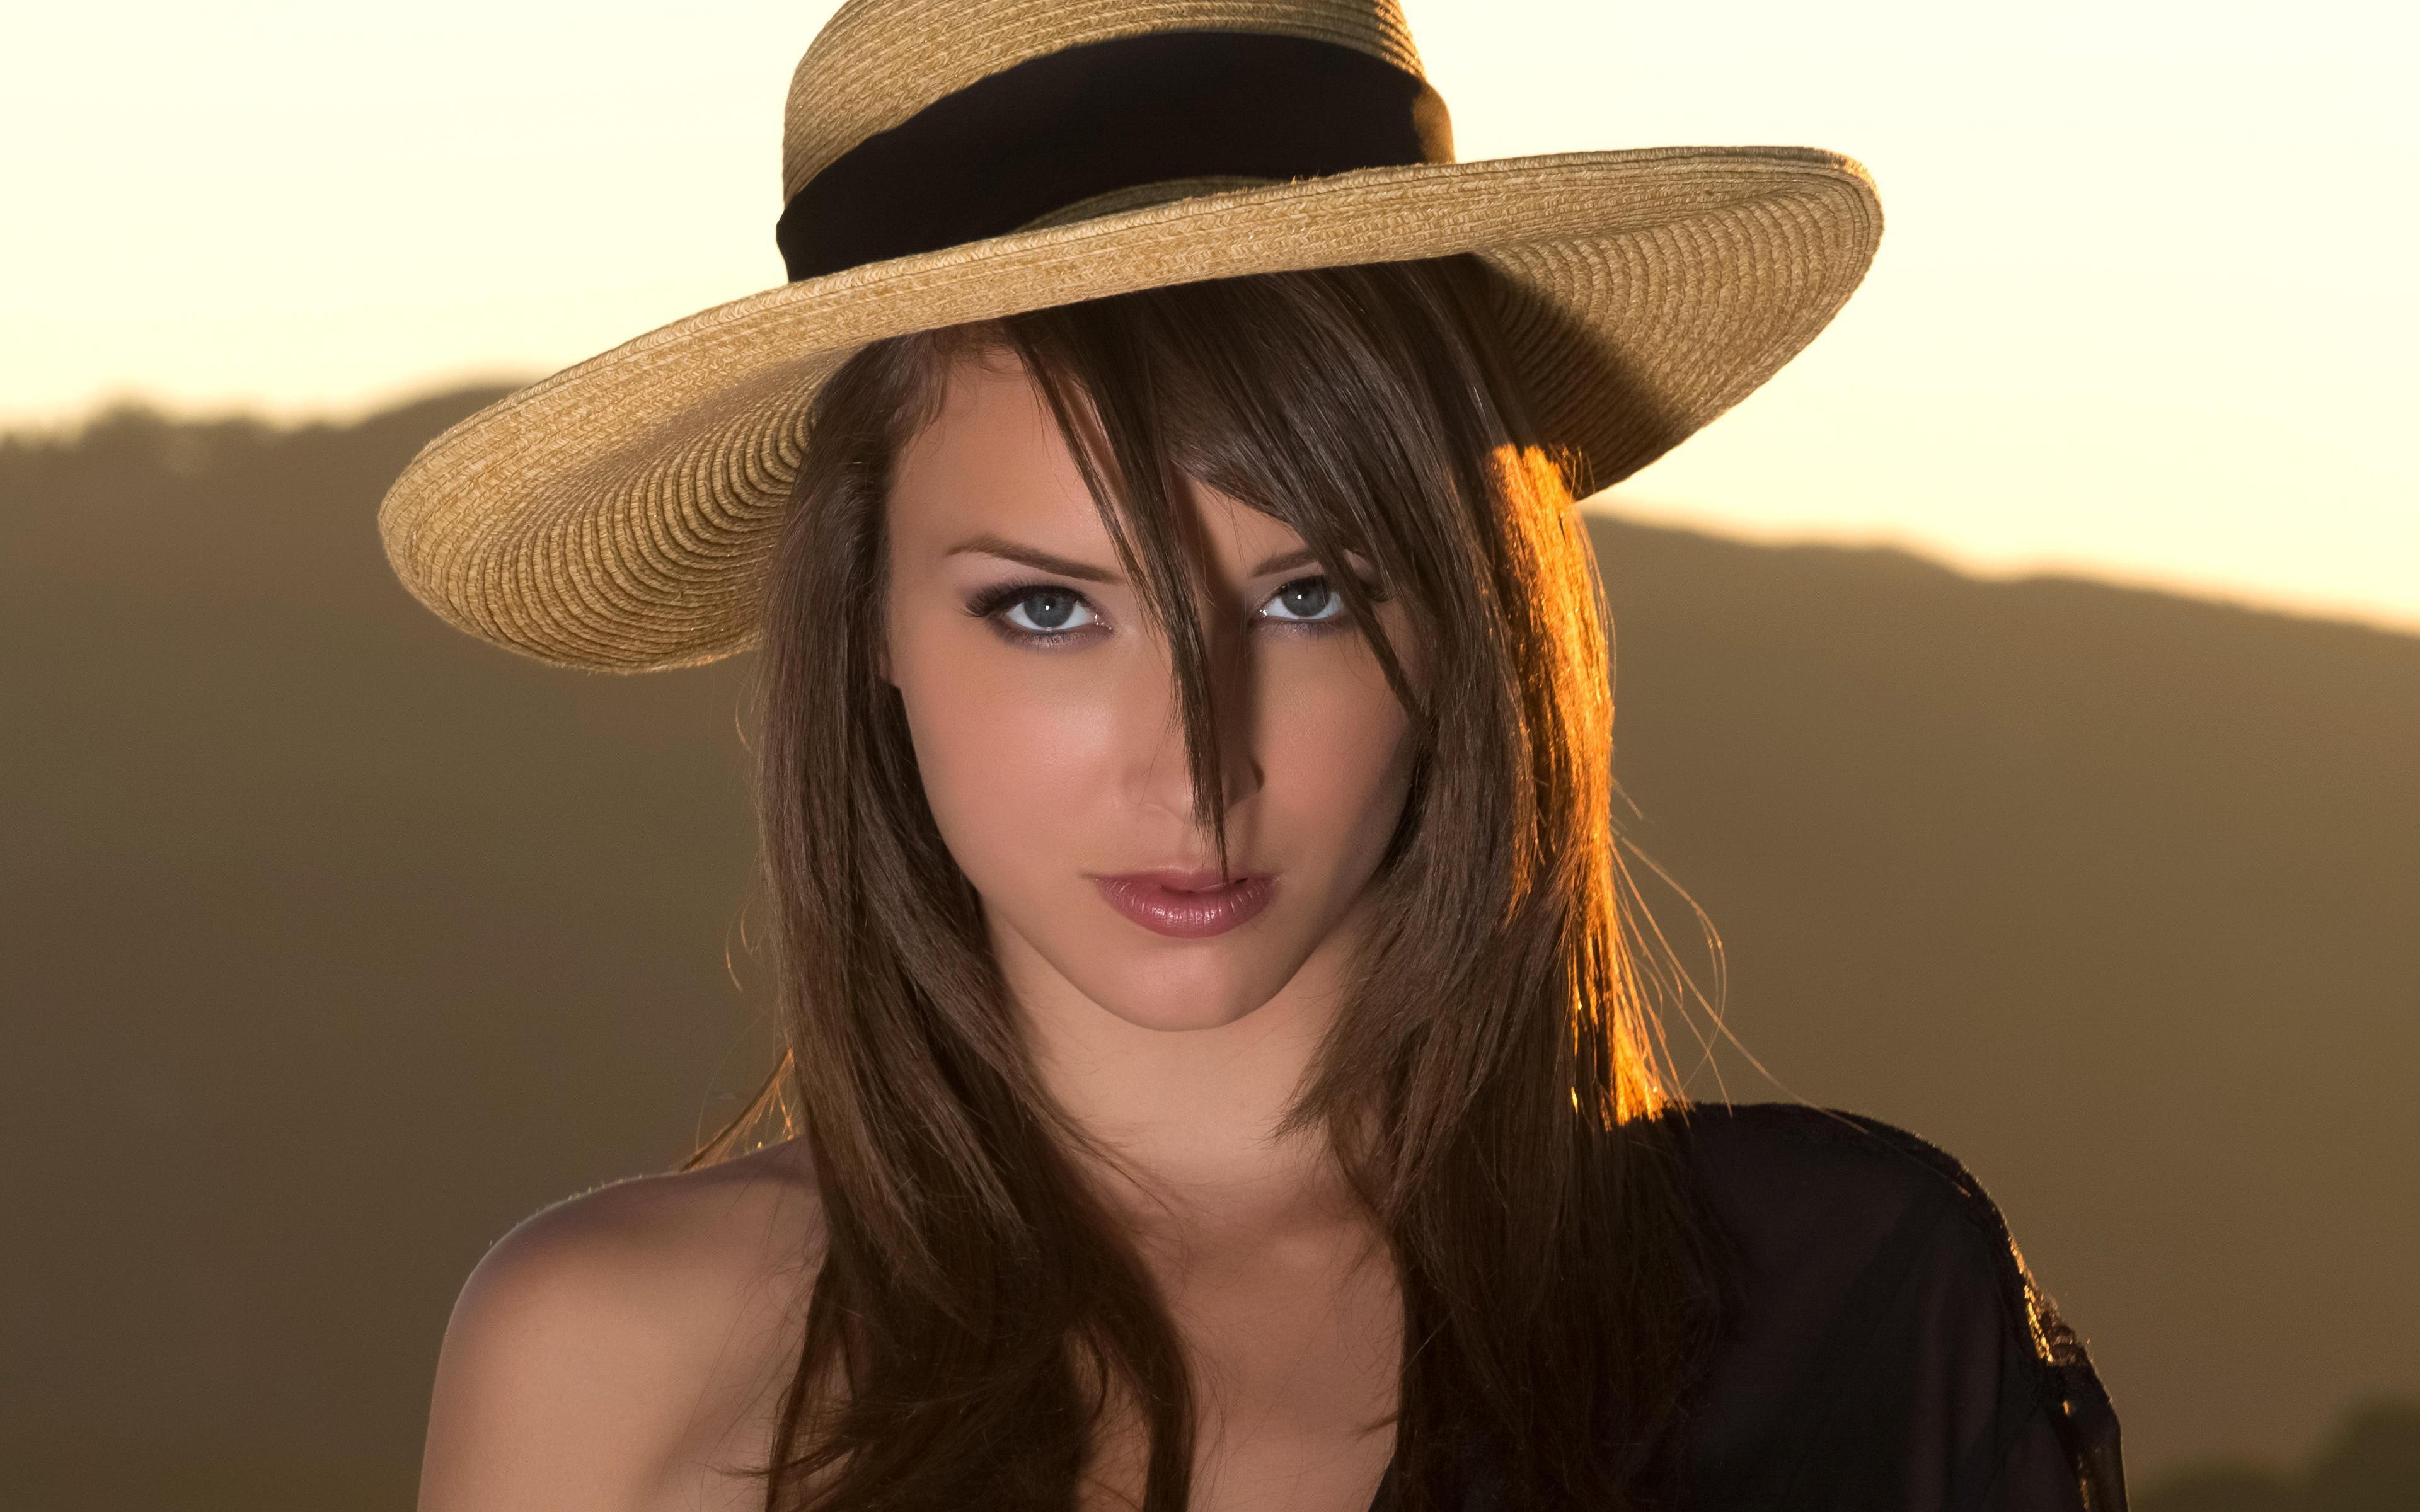 Chicas con sombrero - 3840x2400